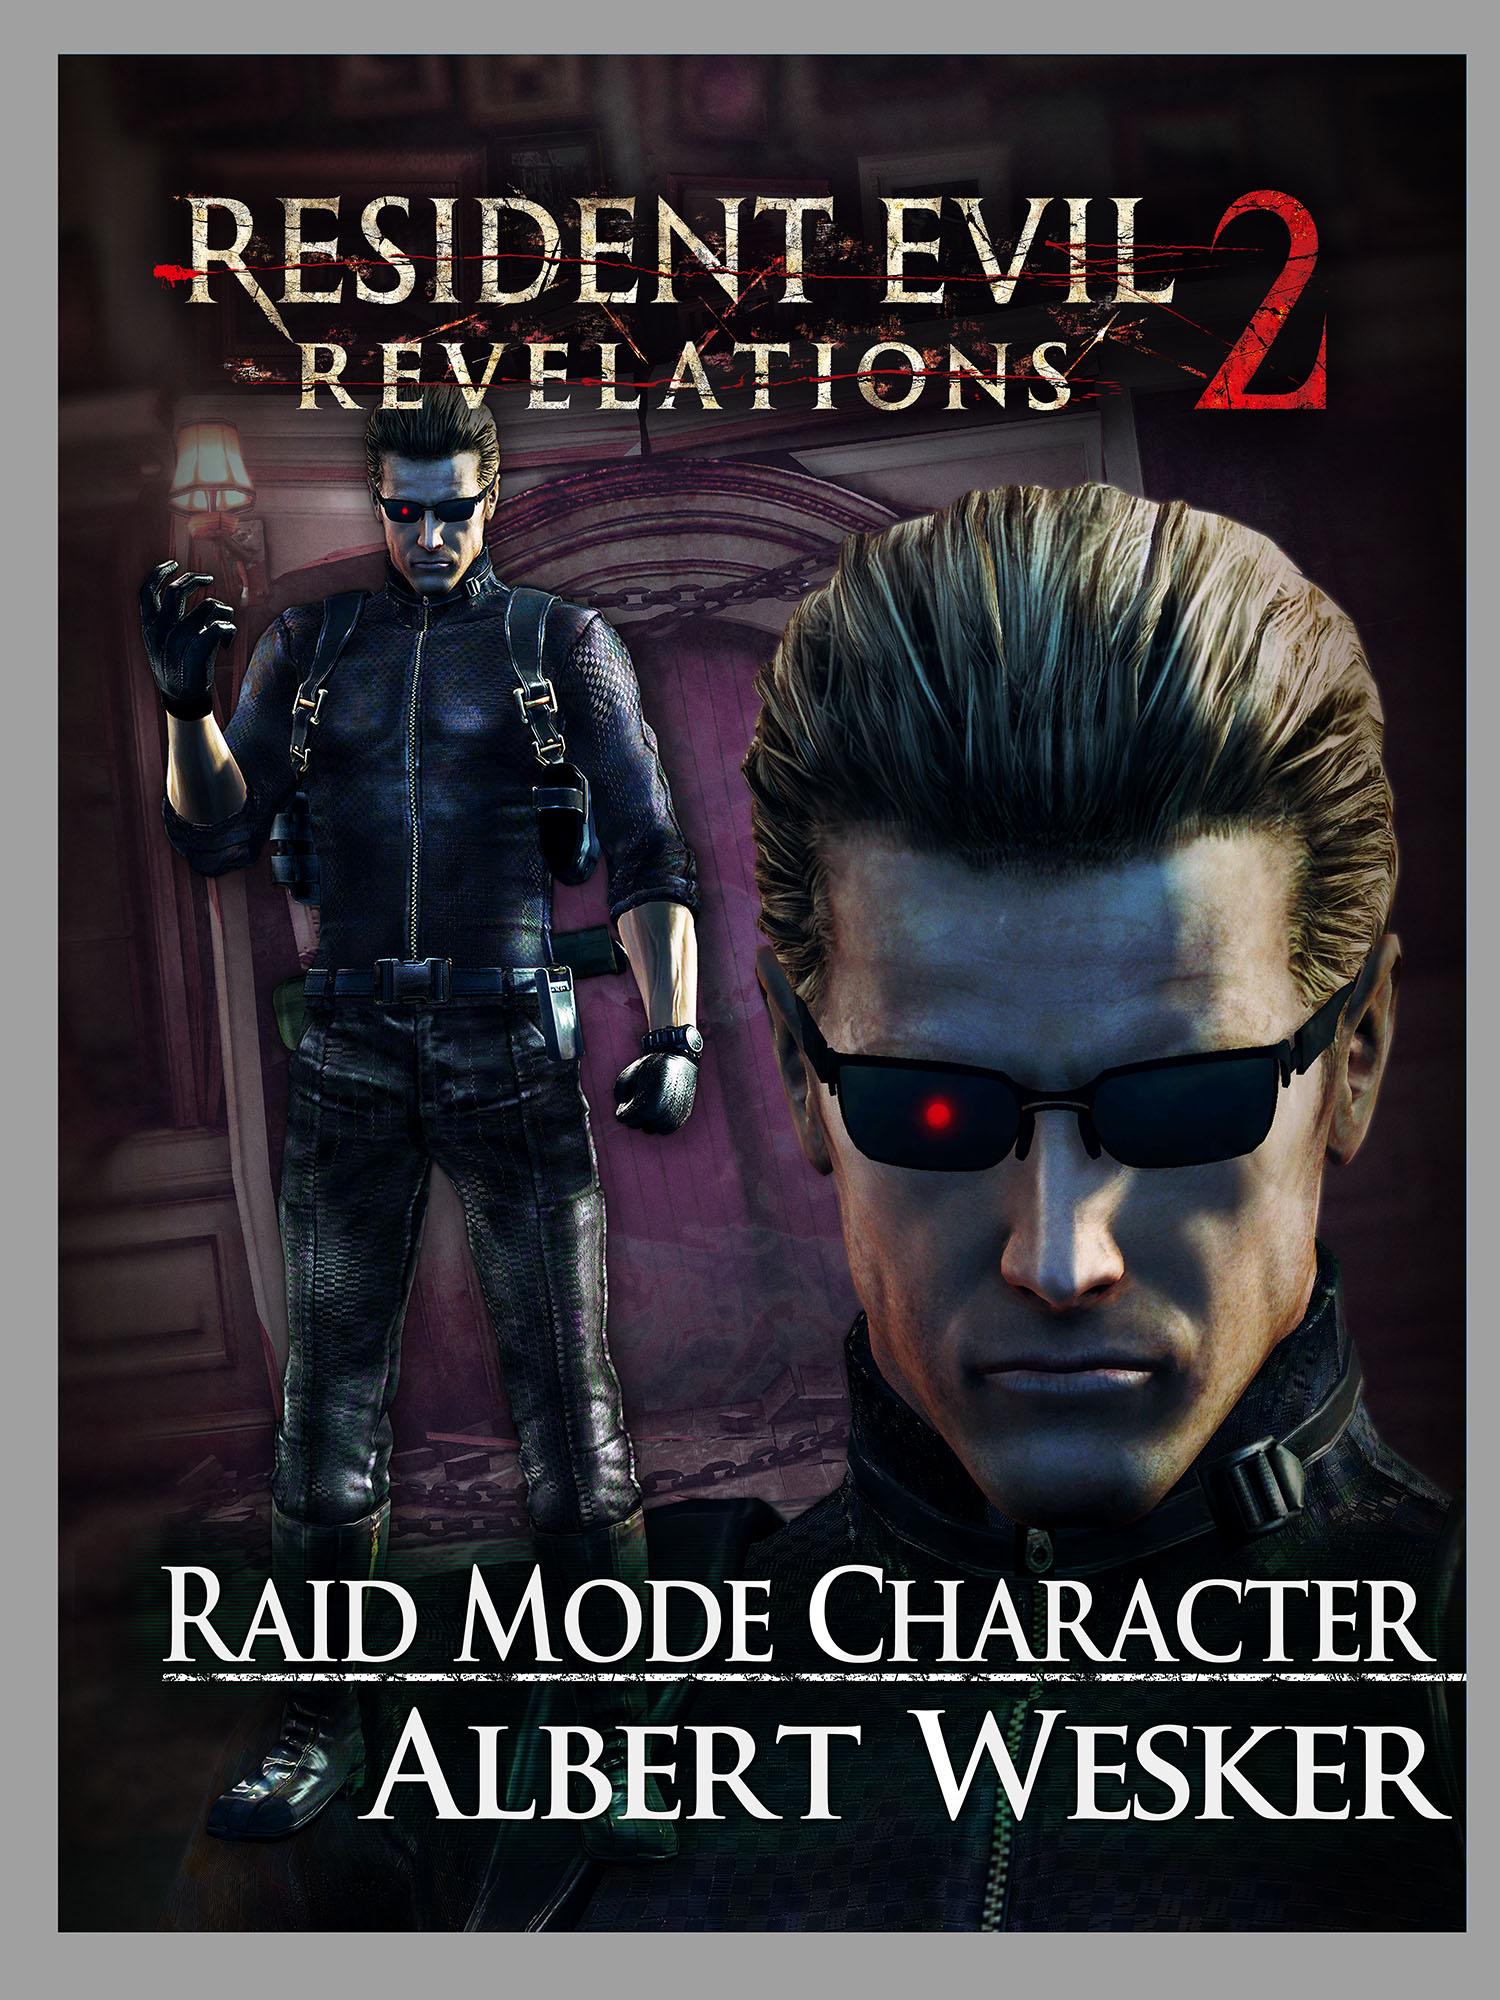 Raid Character Wesker